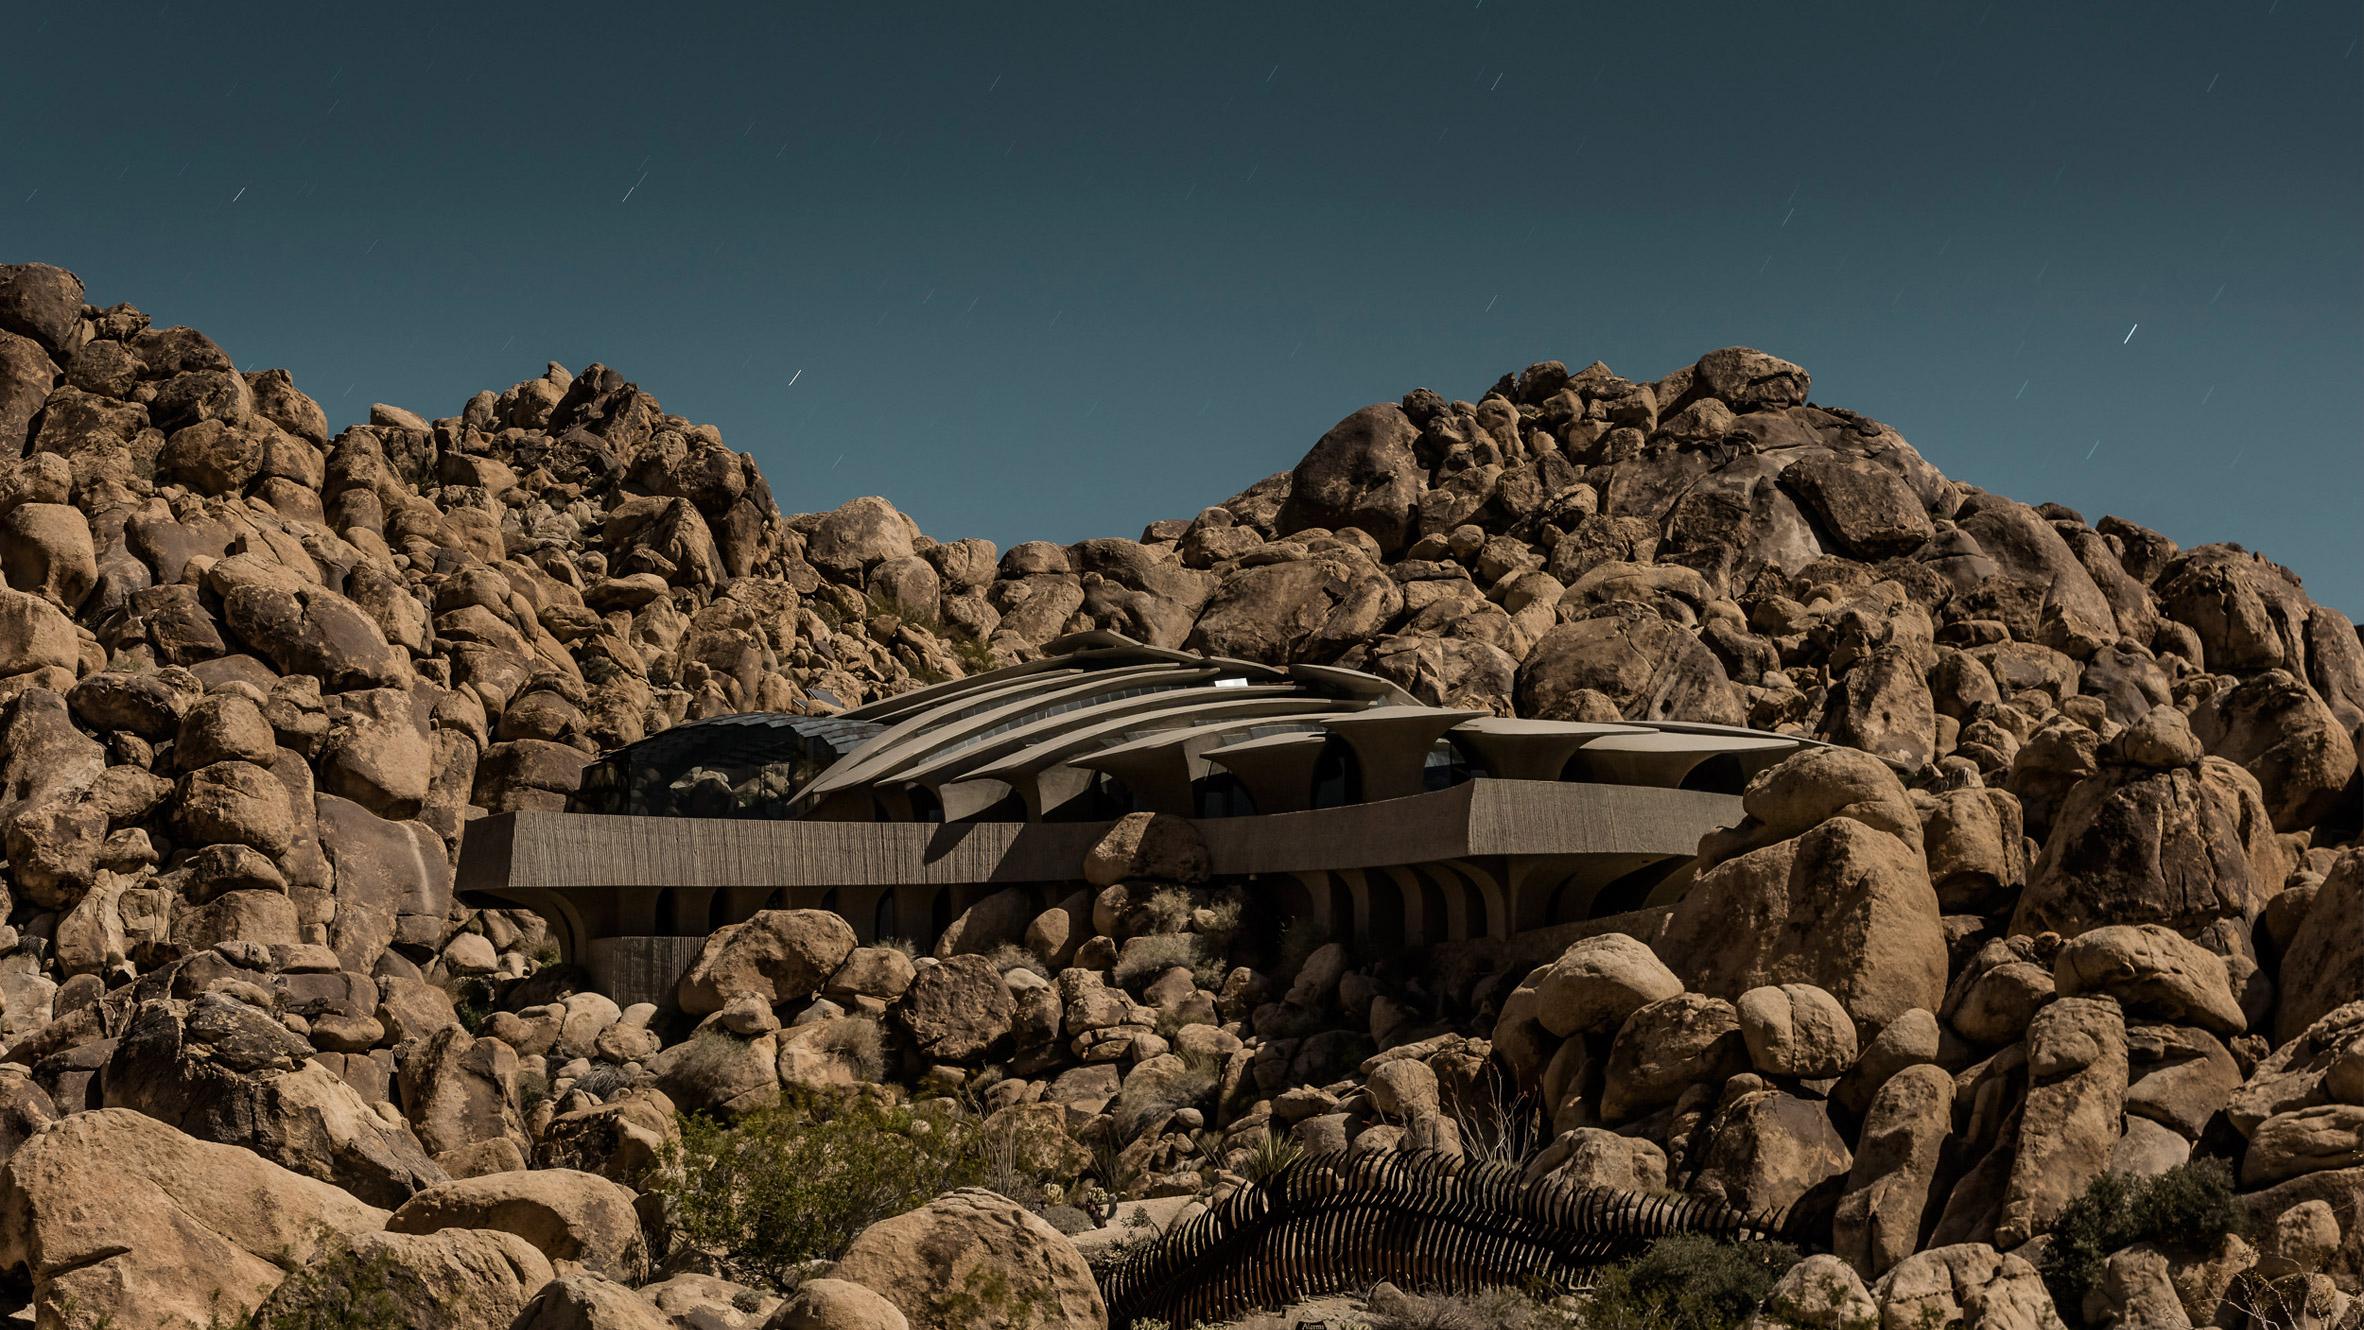 Tom Blachford expands Midnight Modern architecture photo series